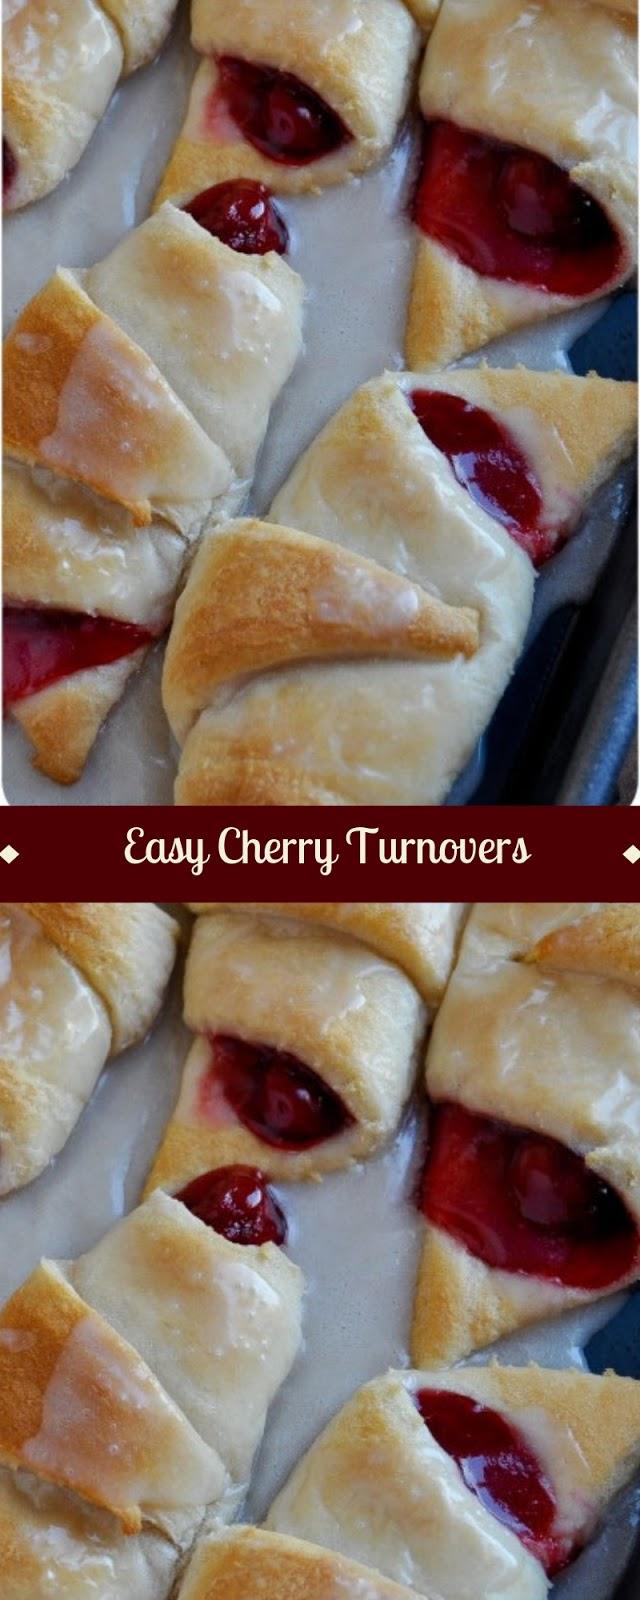 Easy Cherry Turnovers